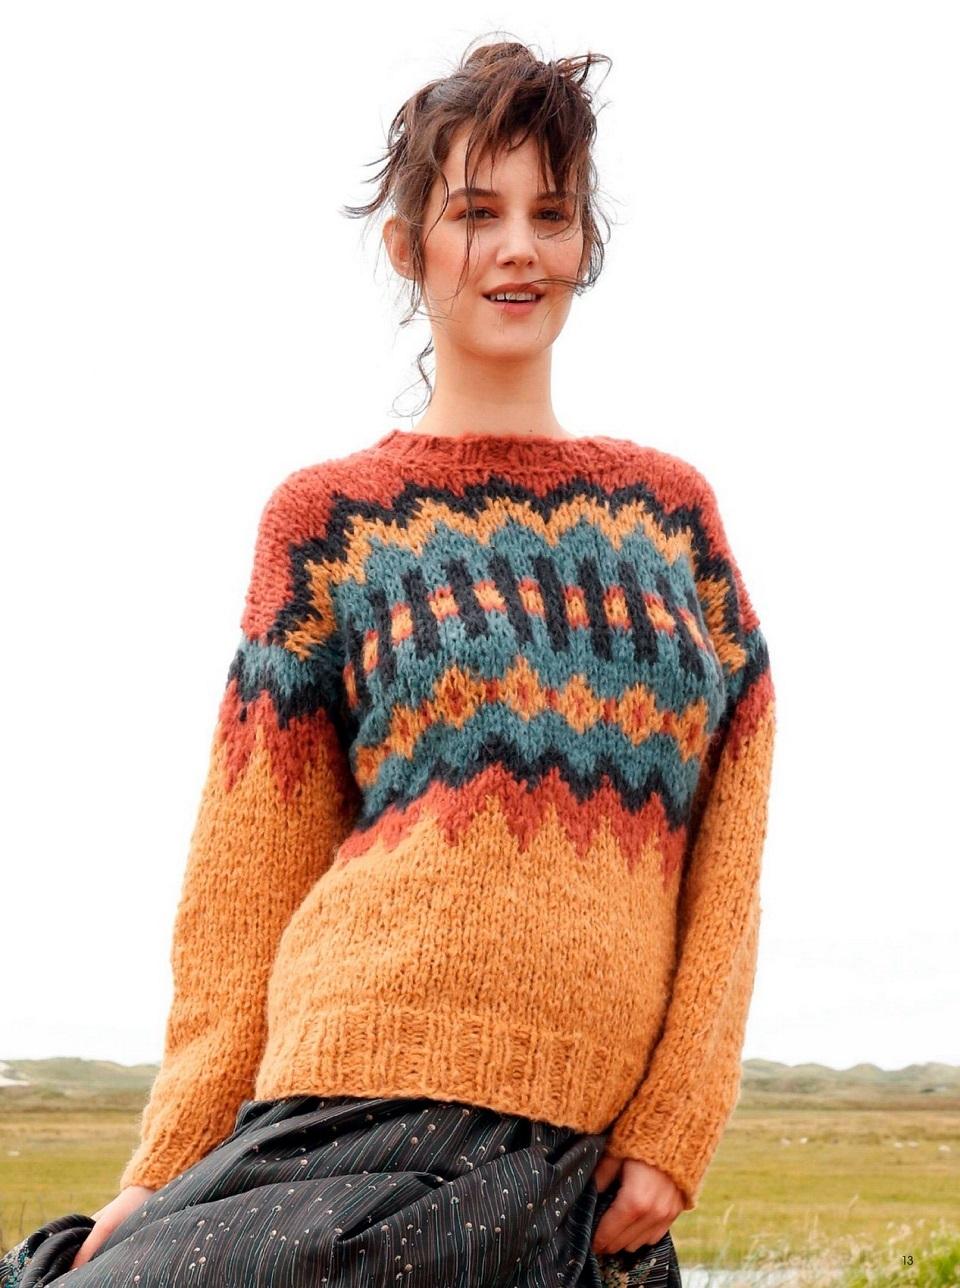 zhakkardovyj pulover spicami s krupnym uzorom - Вязаный пуловер с жаккардовым узором спицами женский